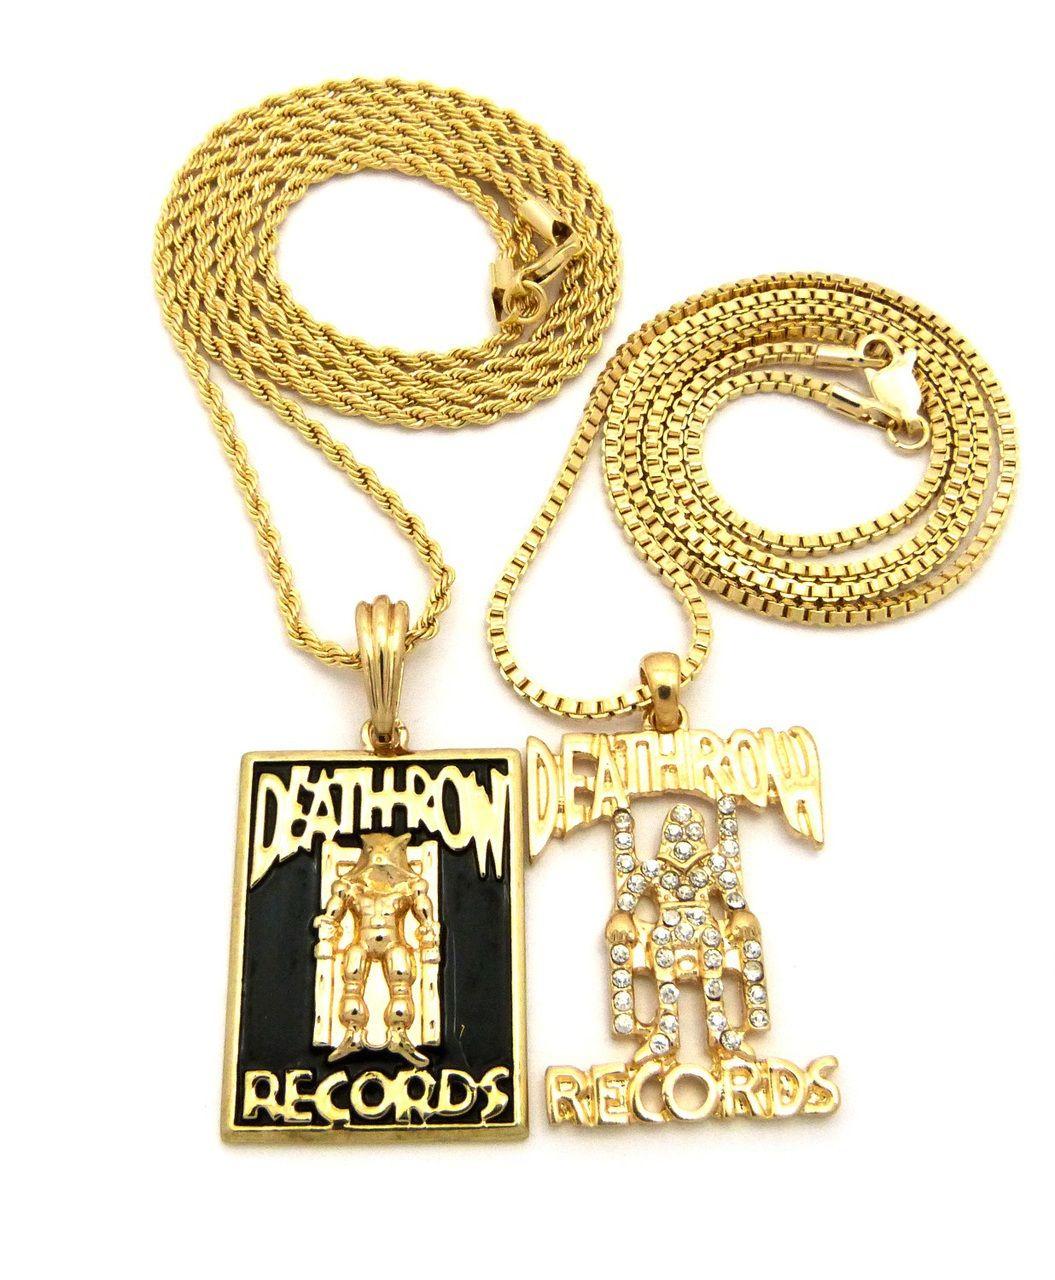 Death row inspired diamond cz hip hop pendant w rope chain death row inspired diamond cz hip hop pendant w rope chain bling jewelz aloadofball Choice Image